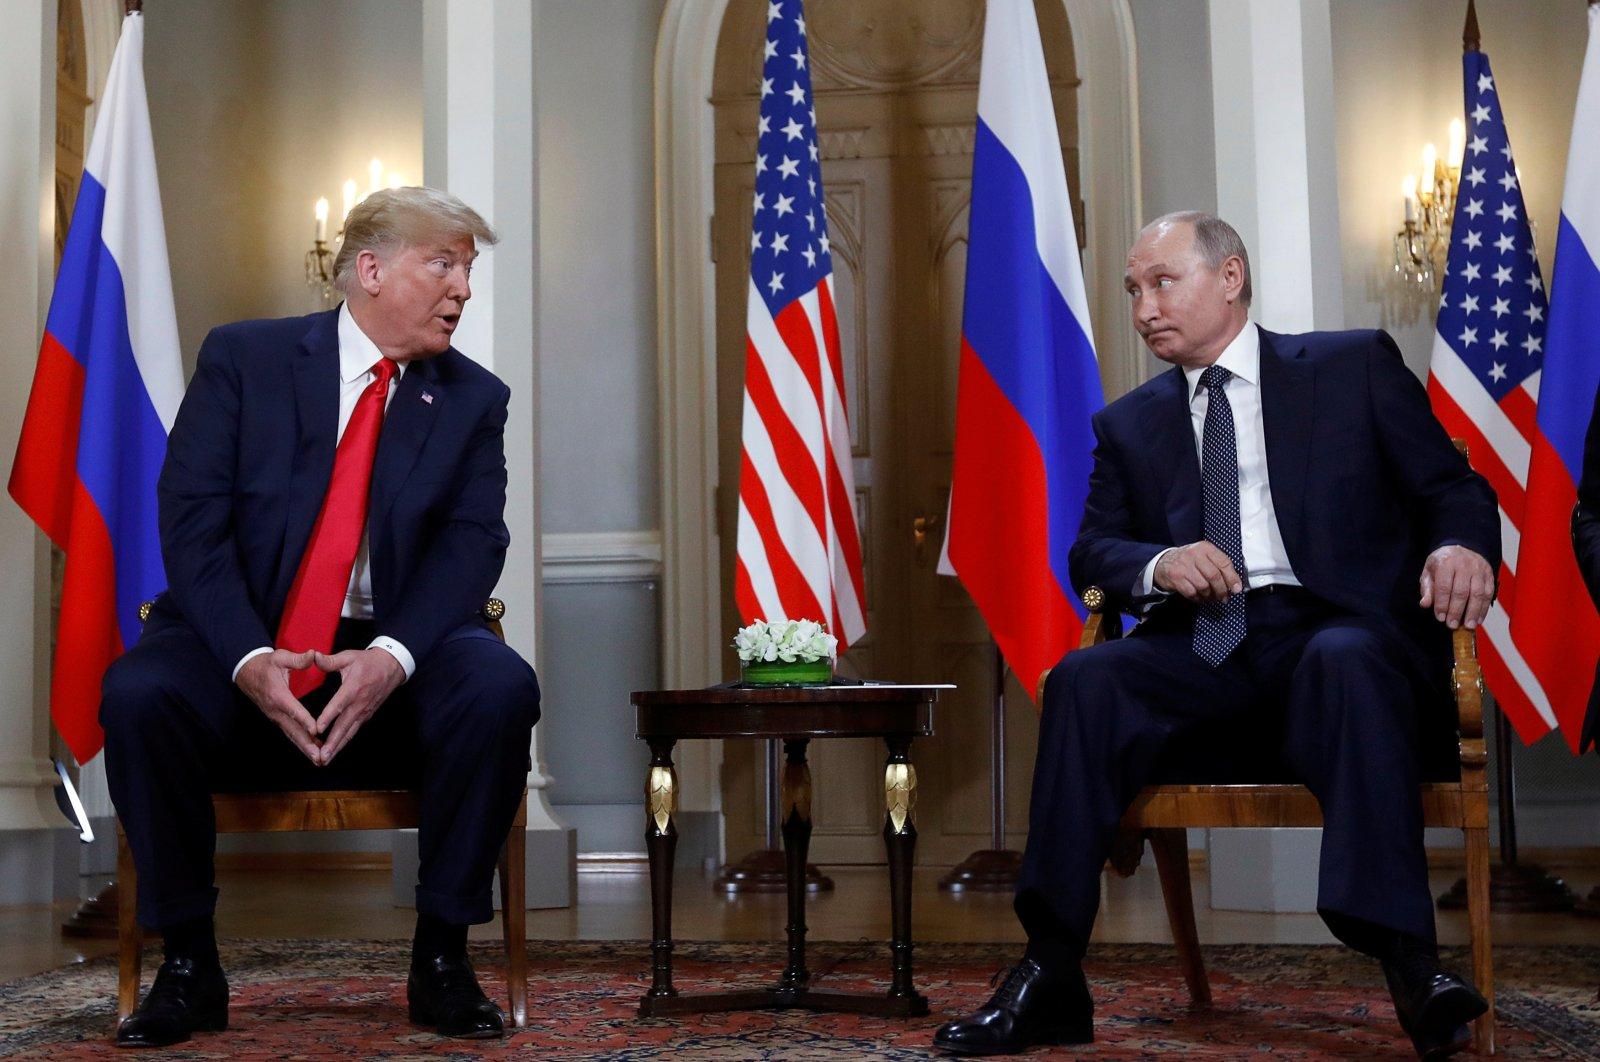 U.S. President Donald Trump meets with Russian President Vladimir Putin in Helsinki, Finland, July 16, 2018. (Reuters File Photo)